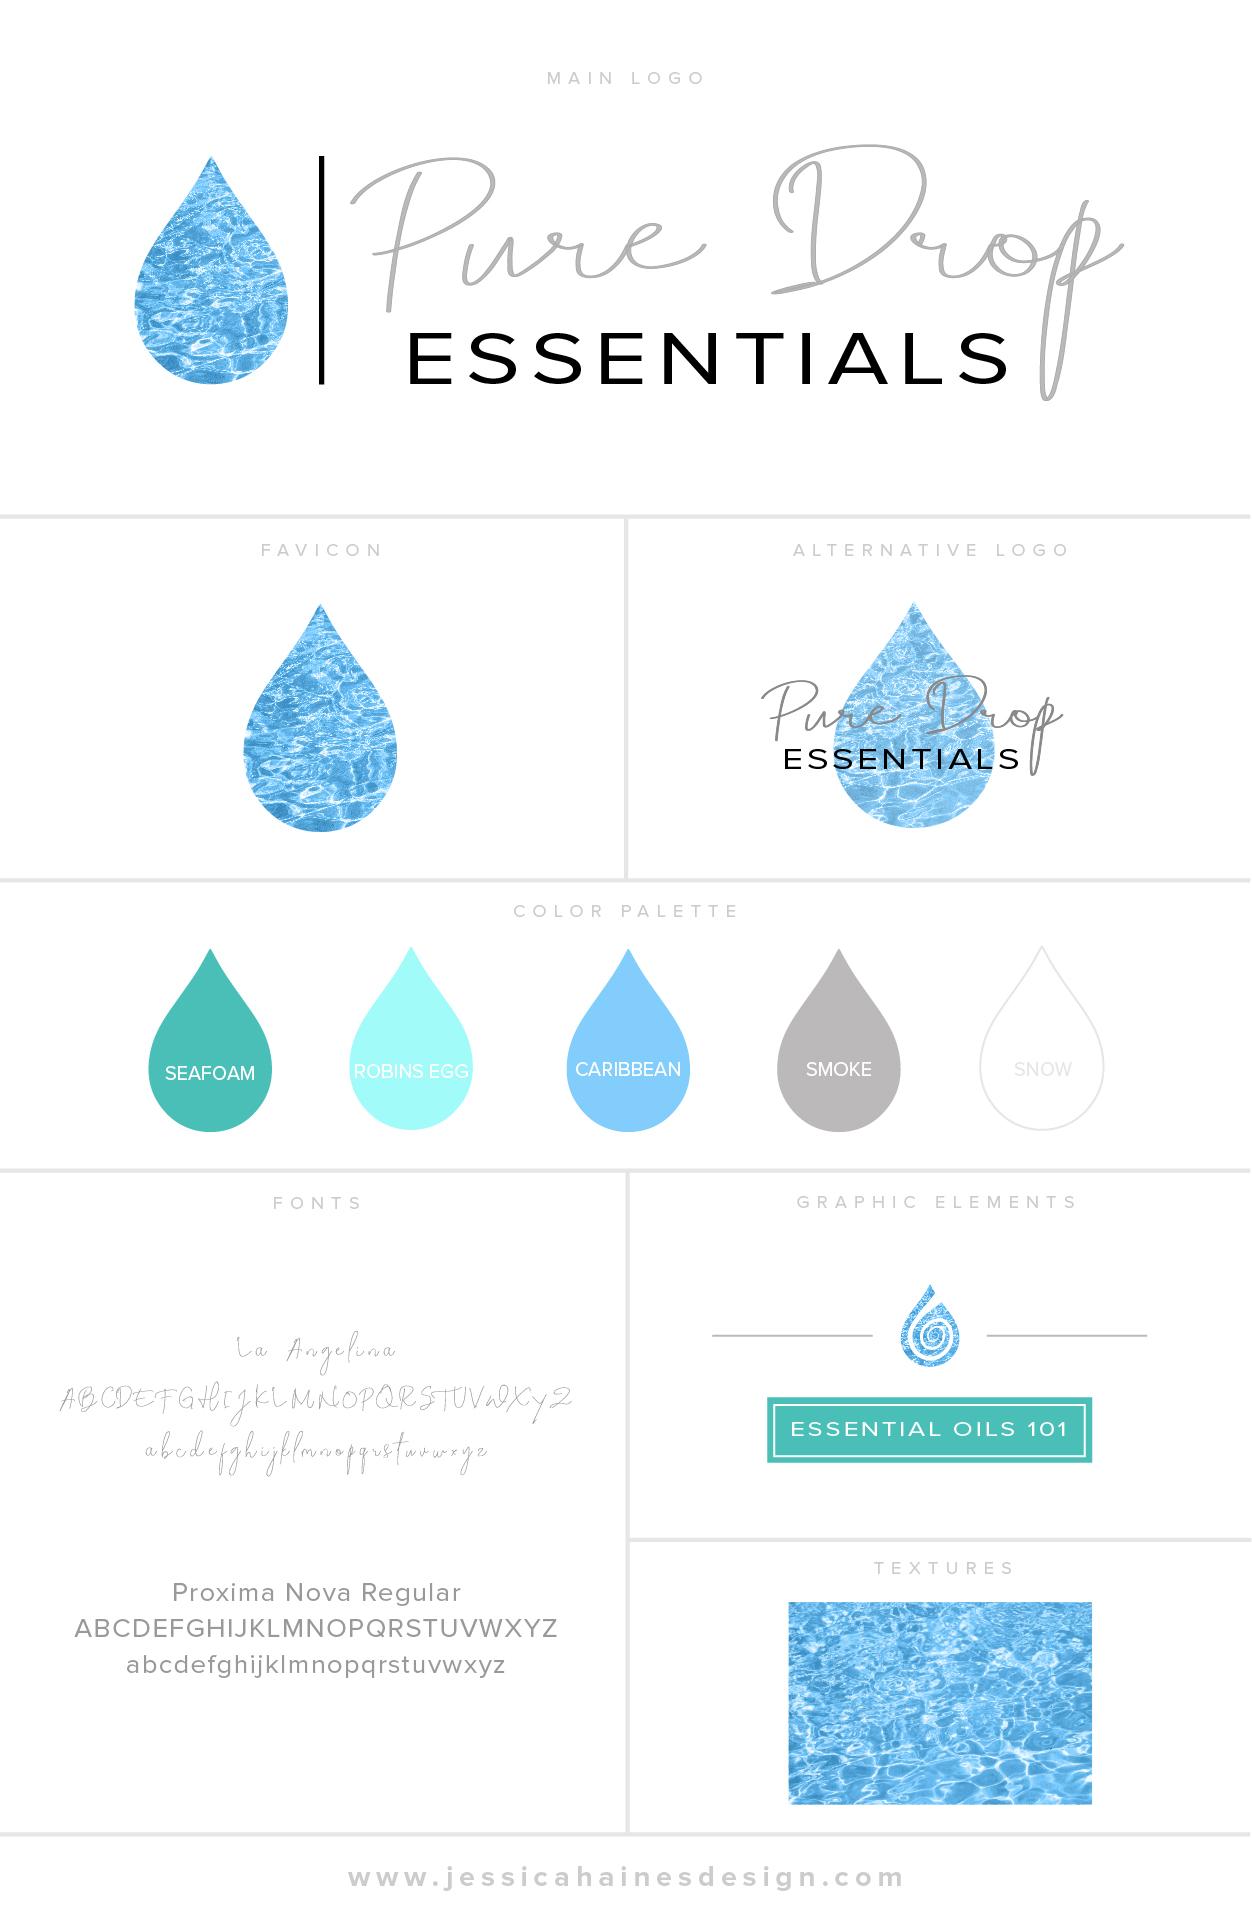 Pure-Drop-Essentials-Branding-Style-Board.jpg